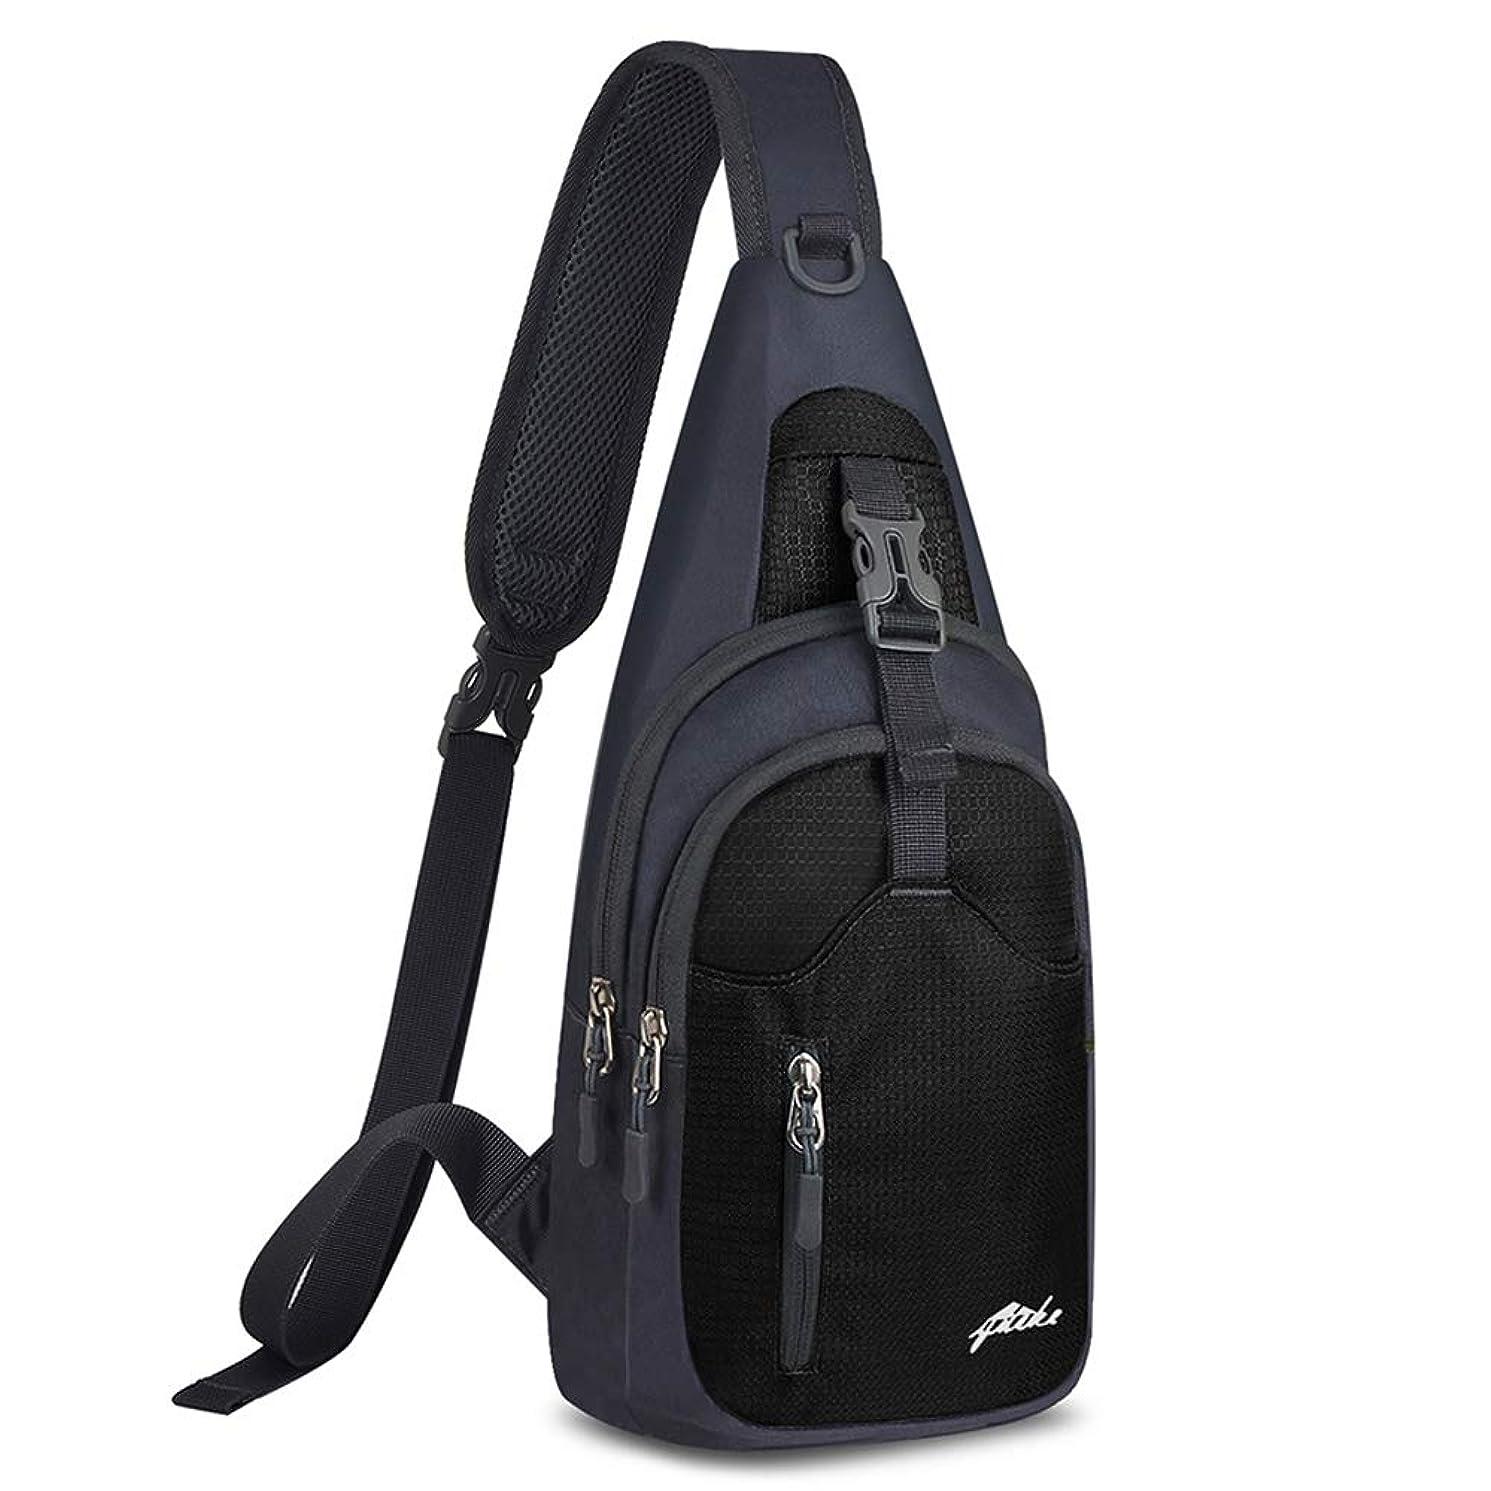 Y&R Direct Sling Bag Sling Backpack,Shoulder Chest Crossbody Bag Purse Nylon Lightweight Multicolor?Small Daypack Outdoor Hiking Camping Travel Women Men Boy Girls Kids Gifts